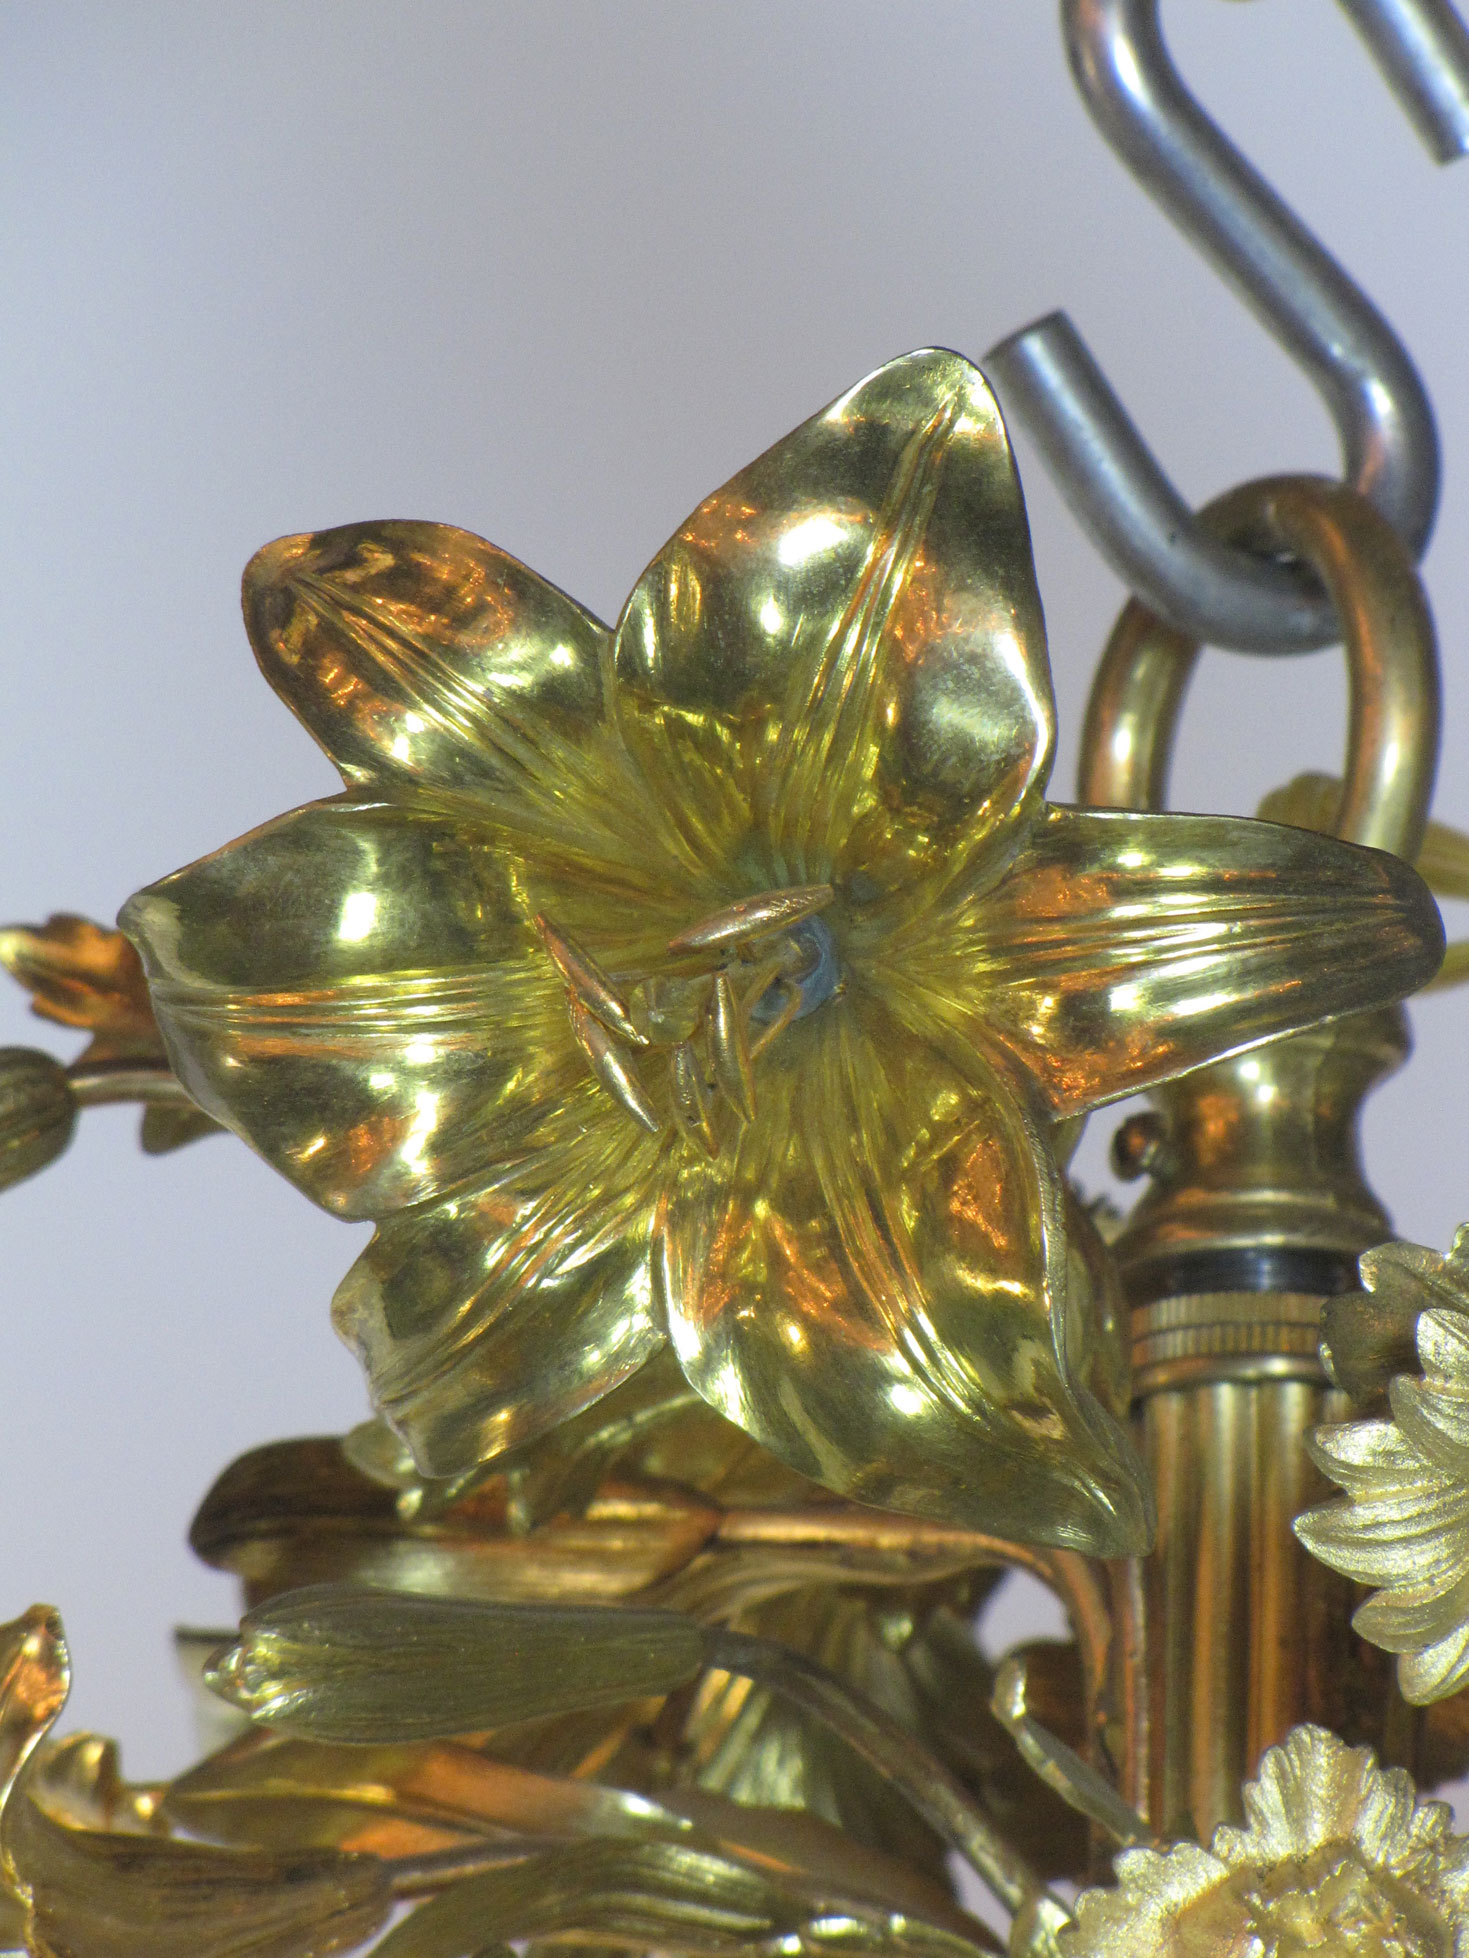 C292j & Gilt Lily Chandelier - Appleton Antique Lighting